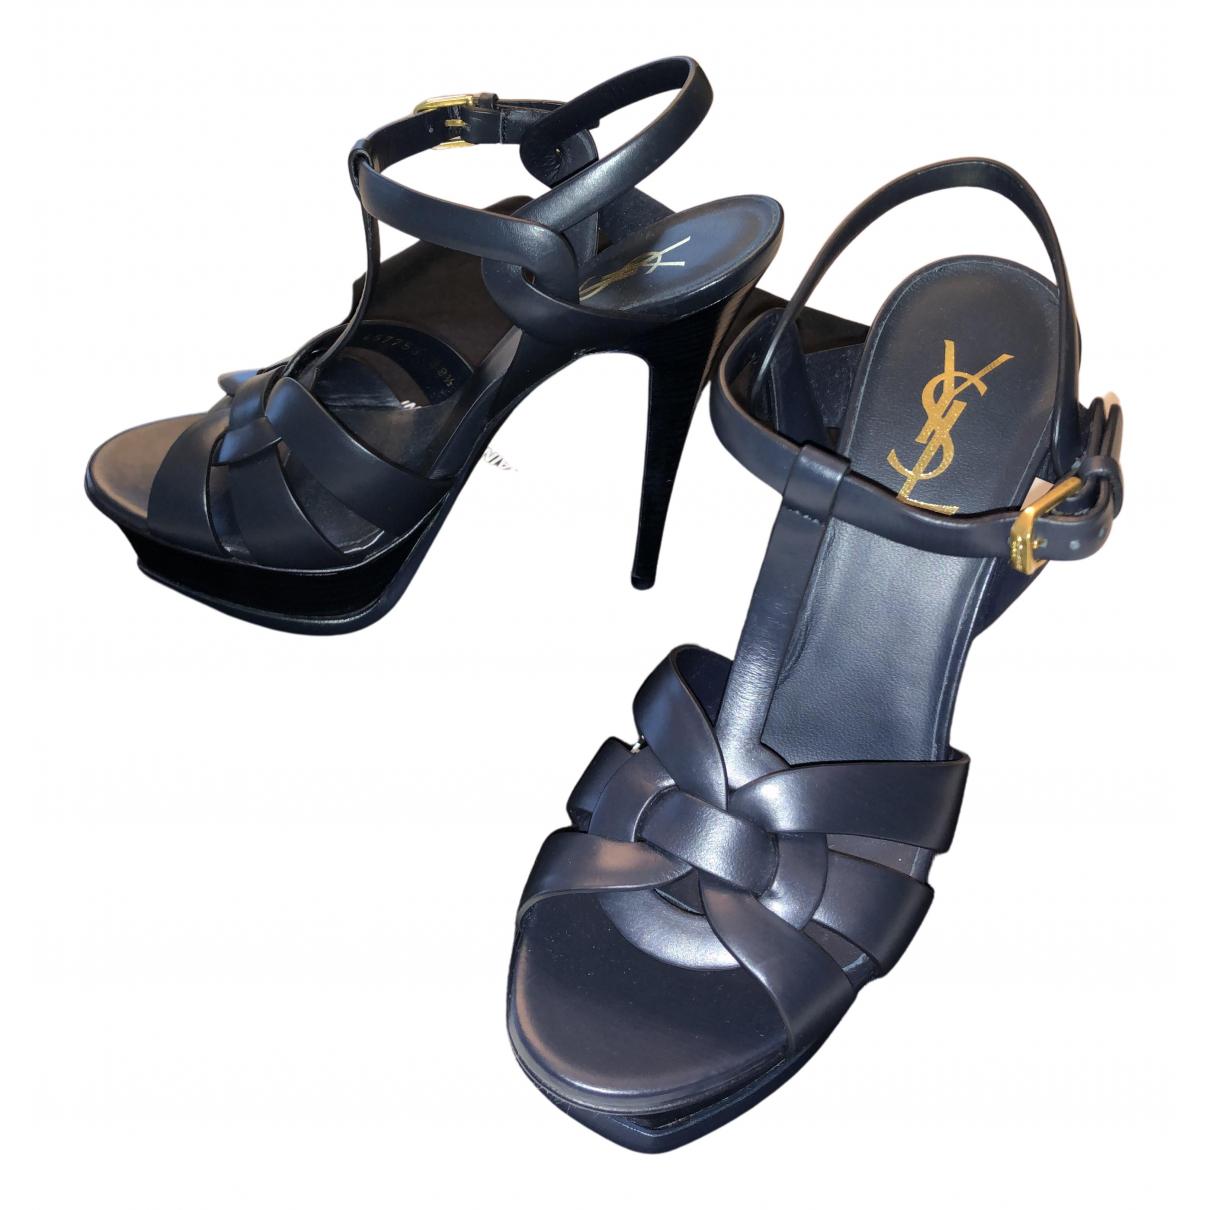 Sandalias Tribute de Cuero Yves Saint Laurent